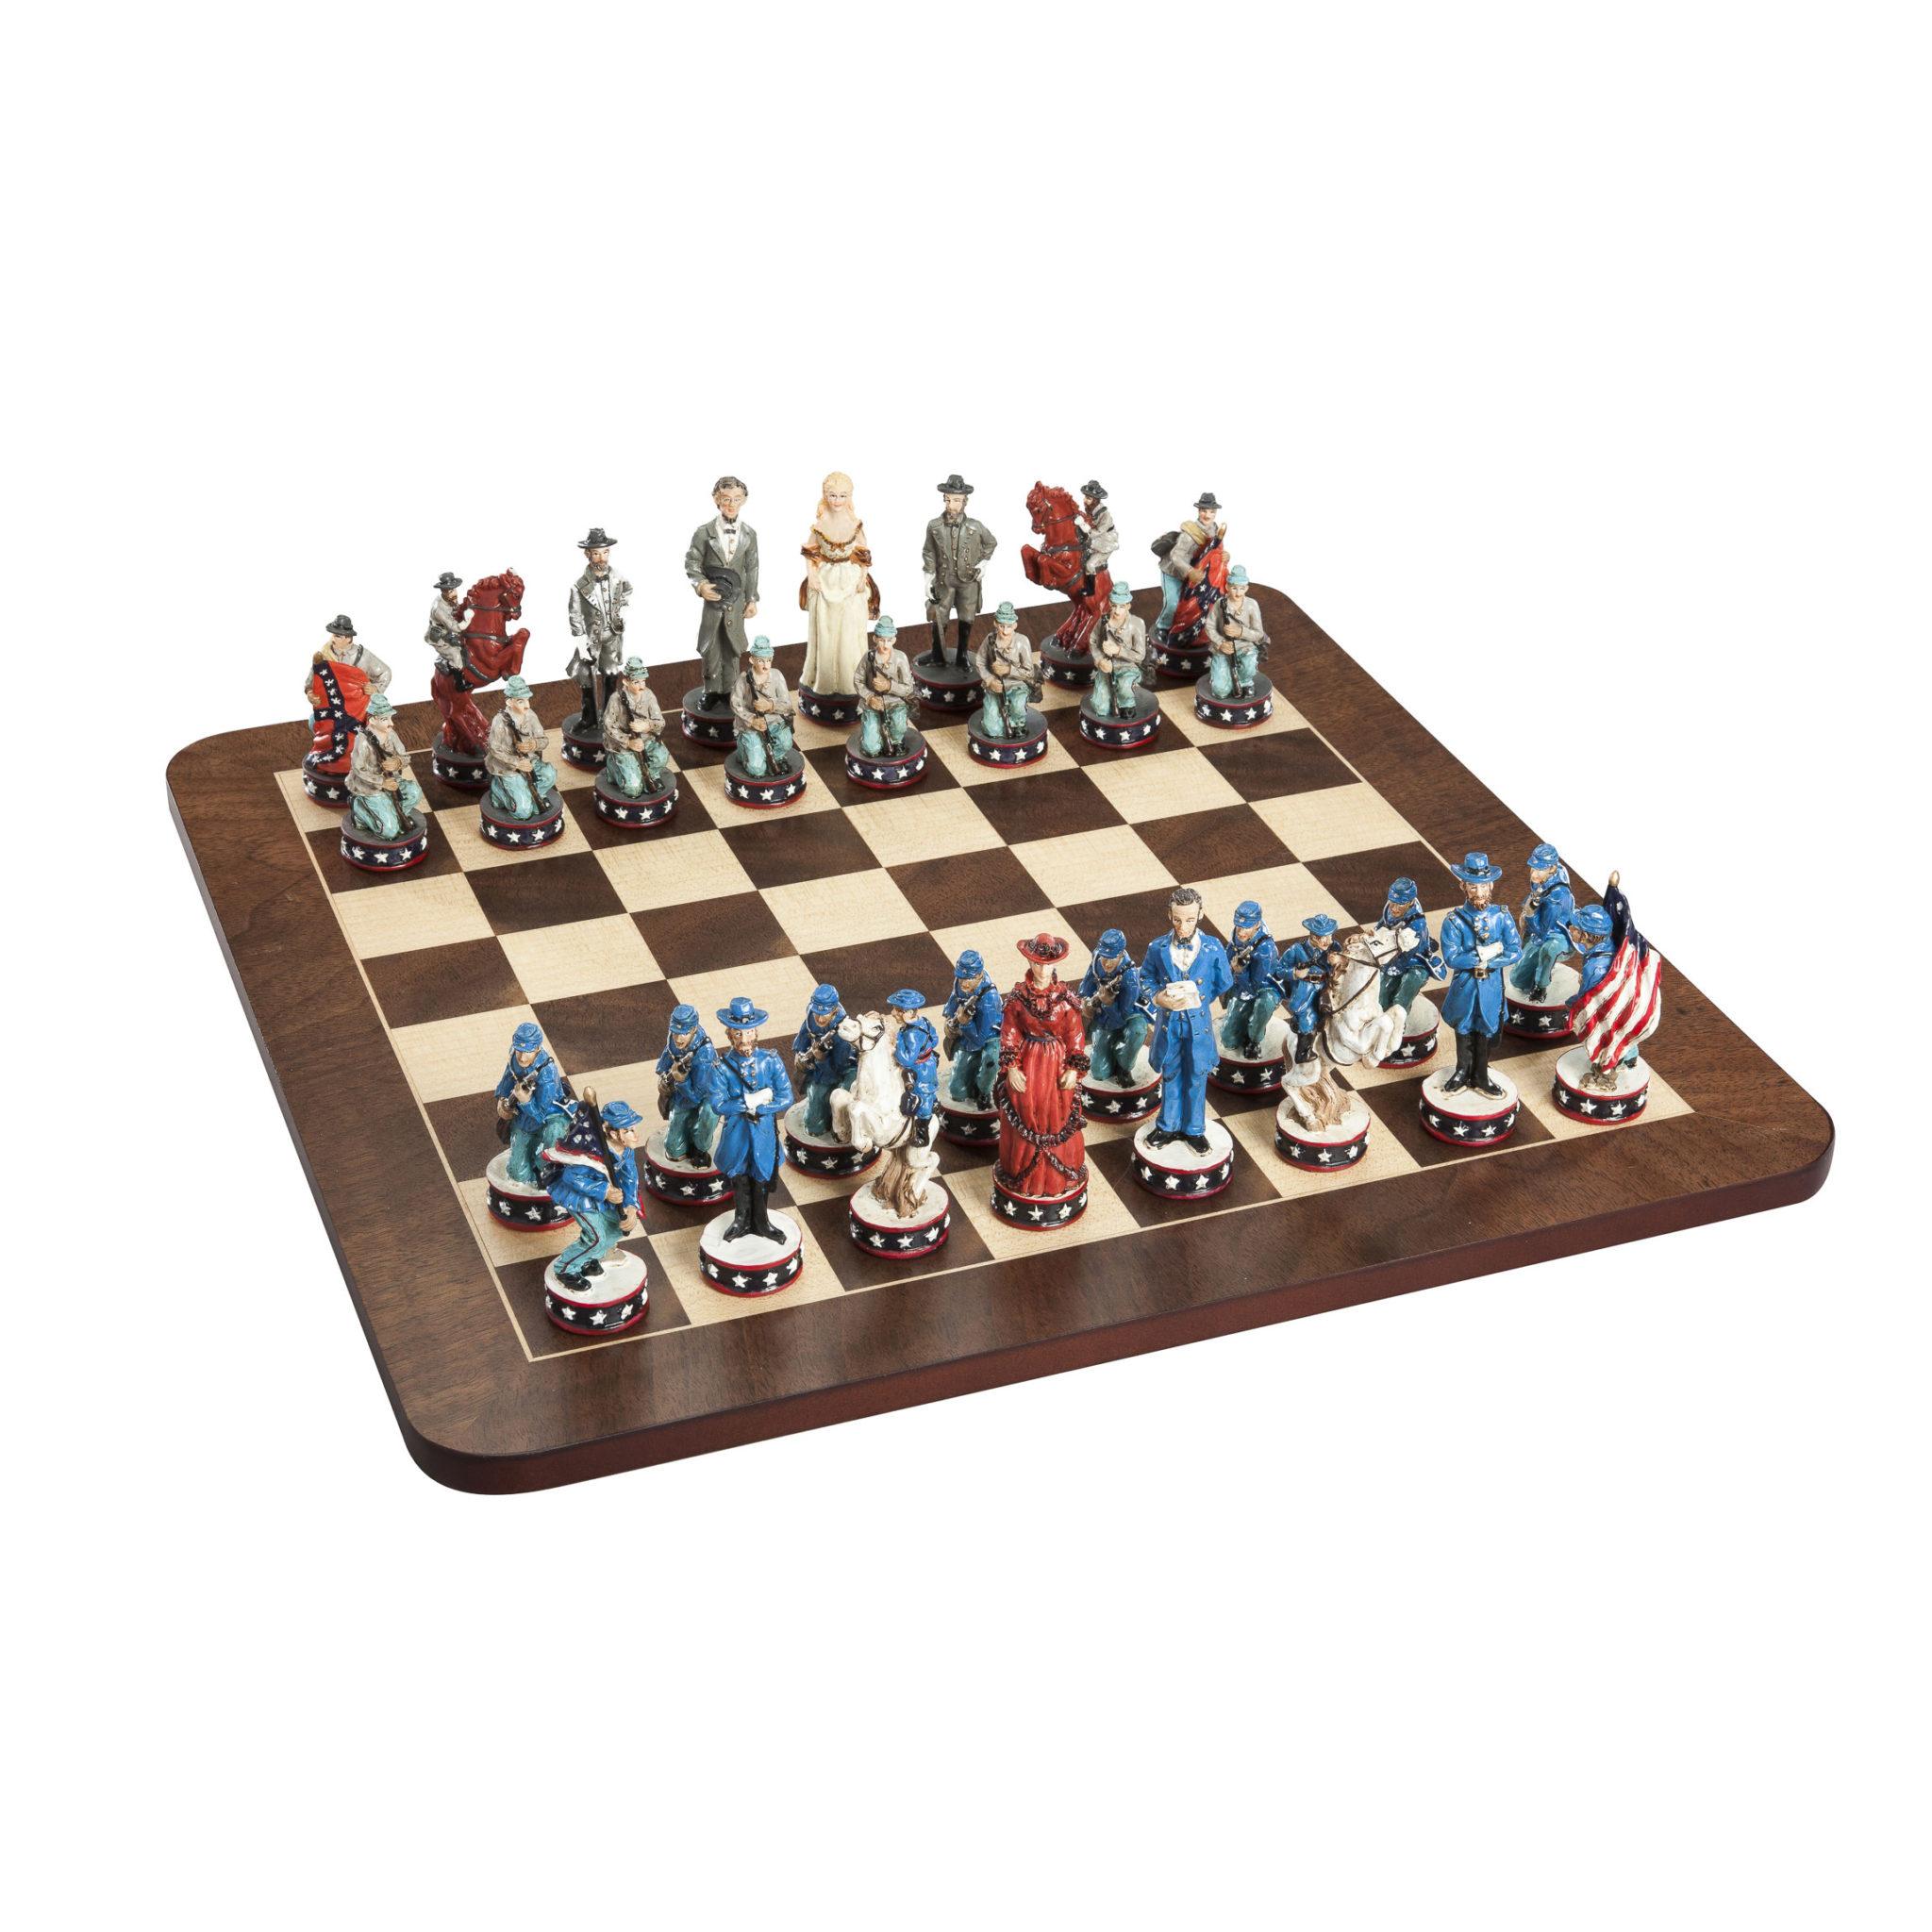 Civil War Chess Set Handpainted Pieces Walnut Root